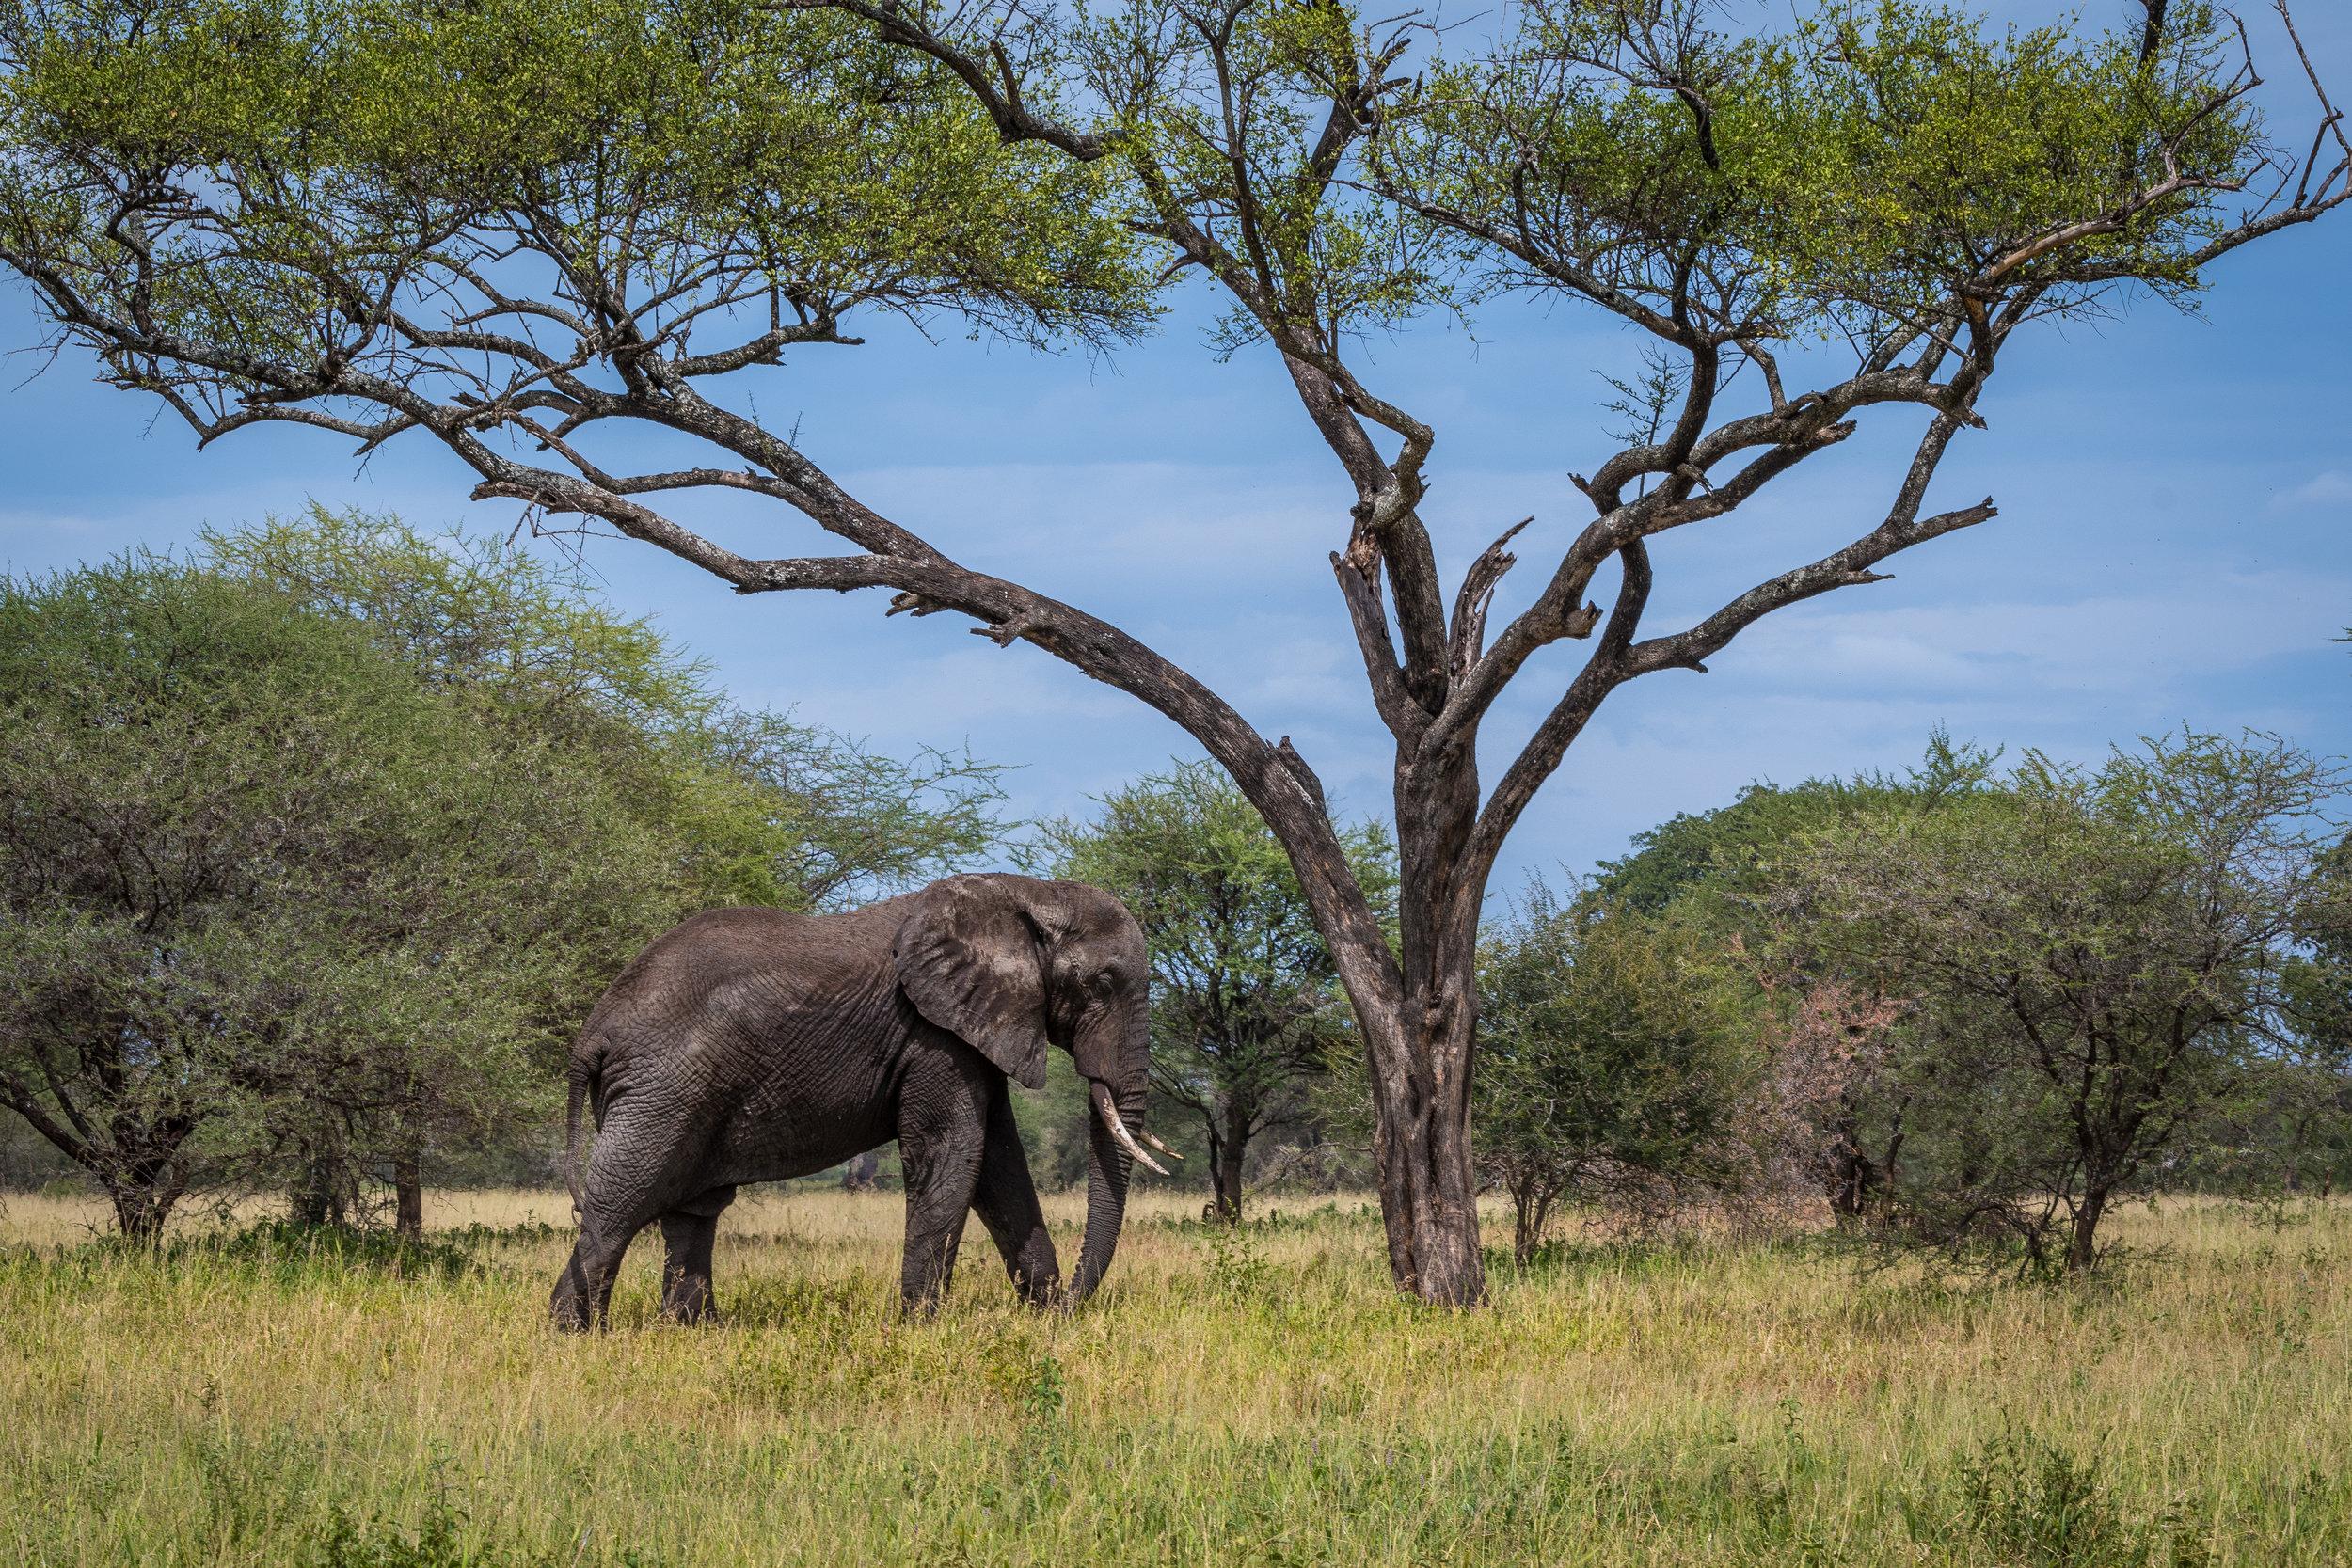 2018-3-6- 03 Elephant.jpg